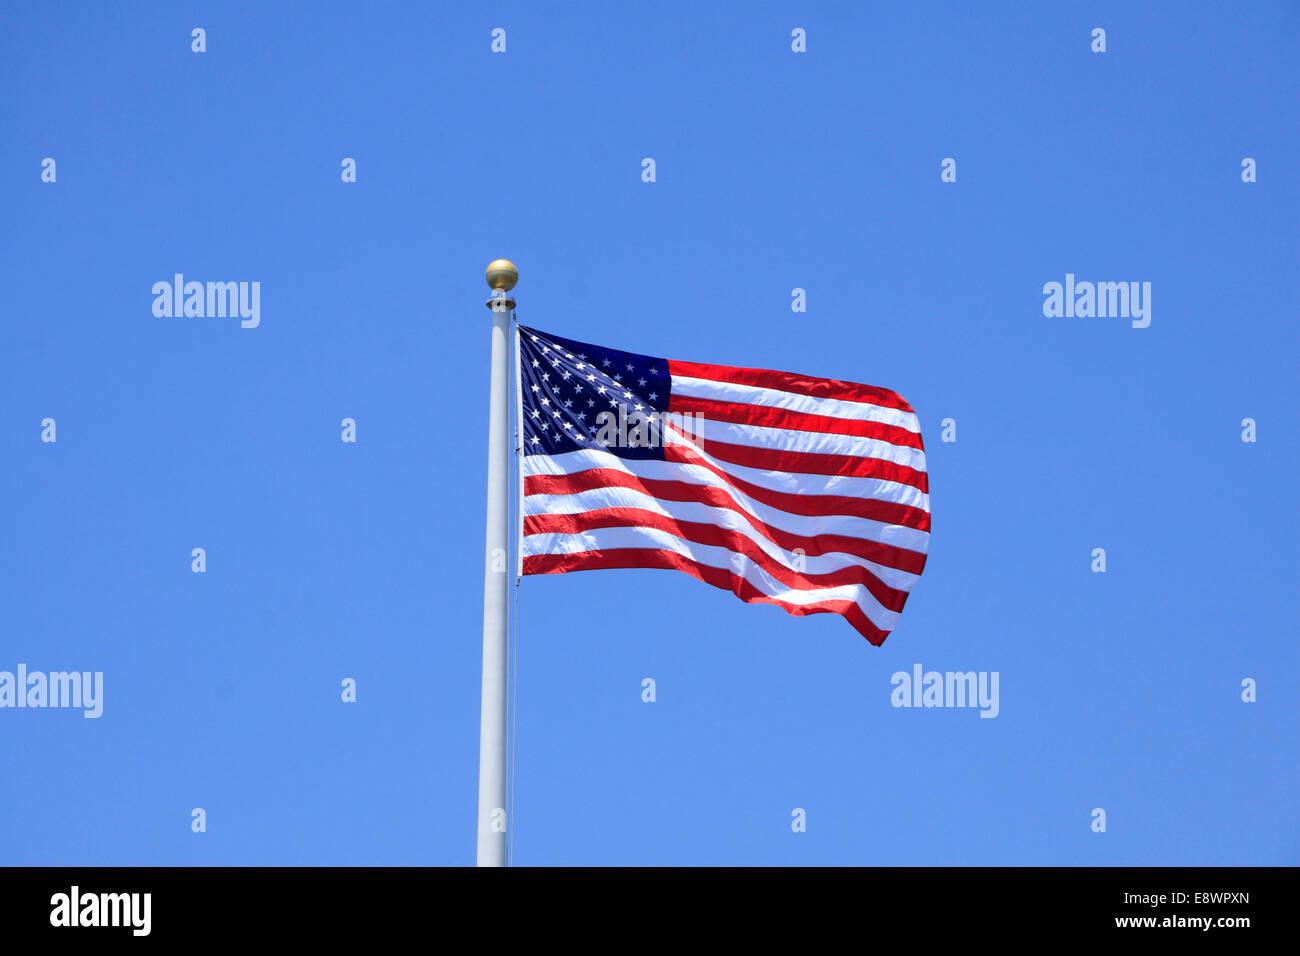 Union Jack at Stearns Wharf in Santa Barbara, California, USA Stock Photo